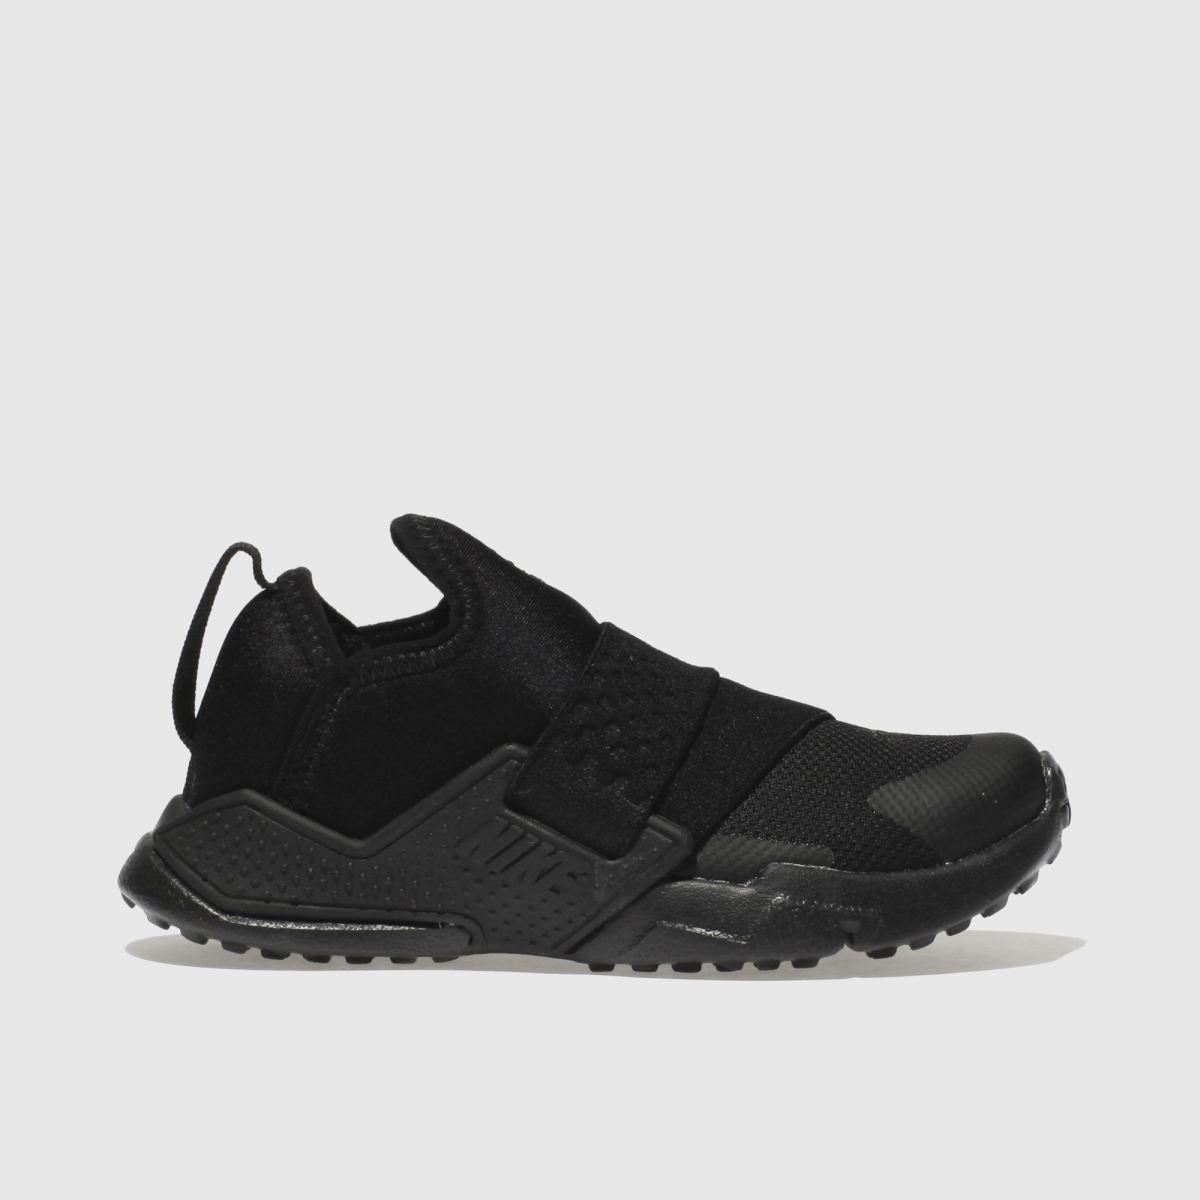 d6c8e70bef Nike Black Huarache Extreme Trainers Toddler